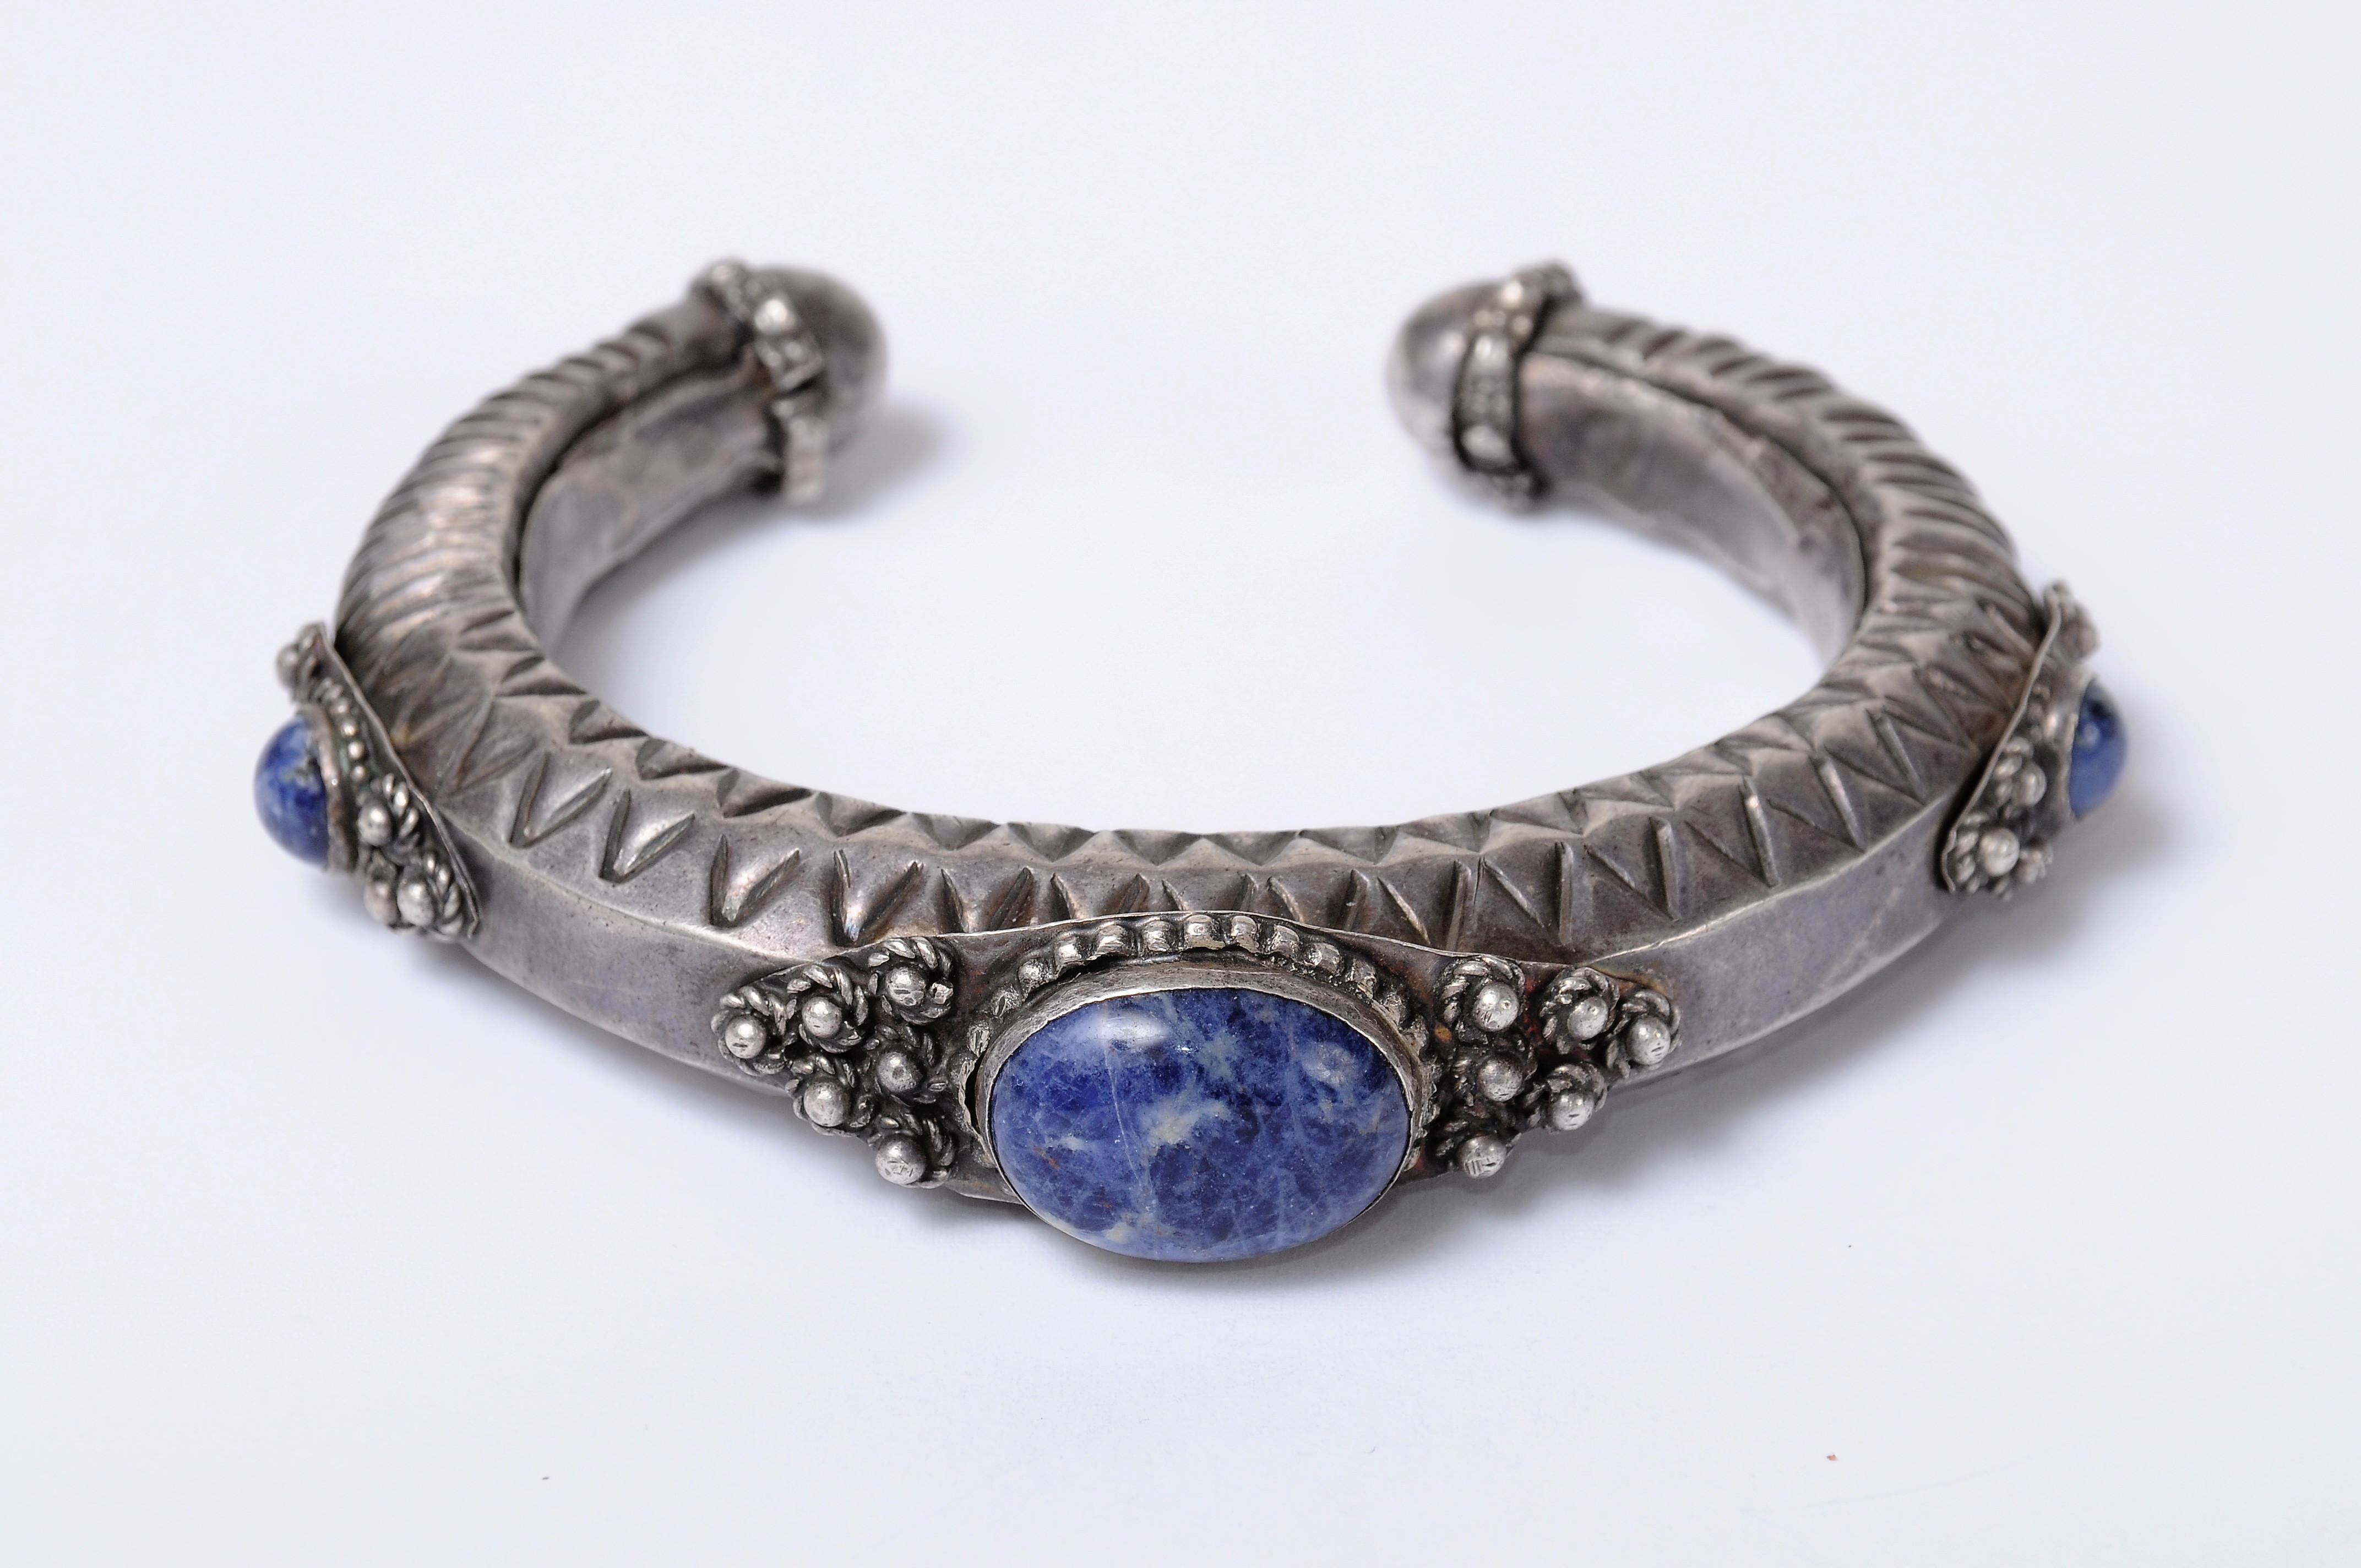 Ethnic Oriental Cuff Israel 925 Silver Bracelet set with Agate Stone